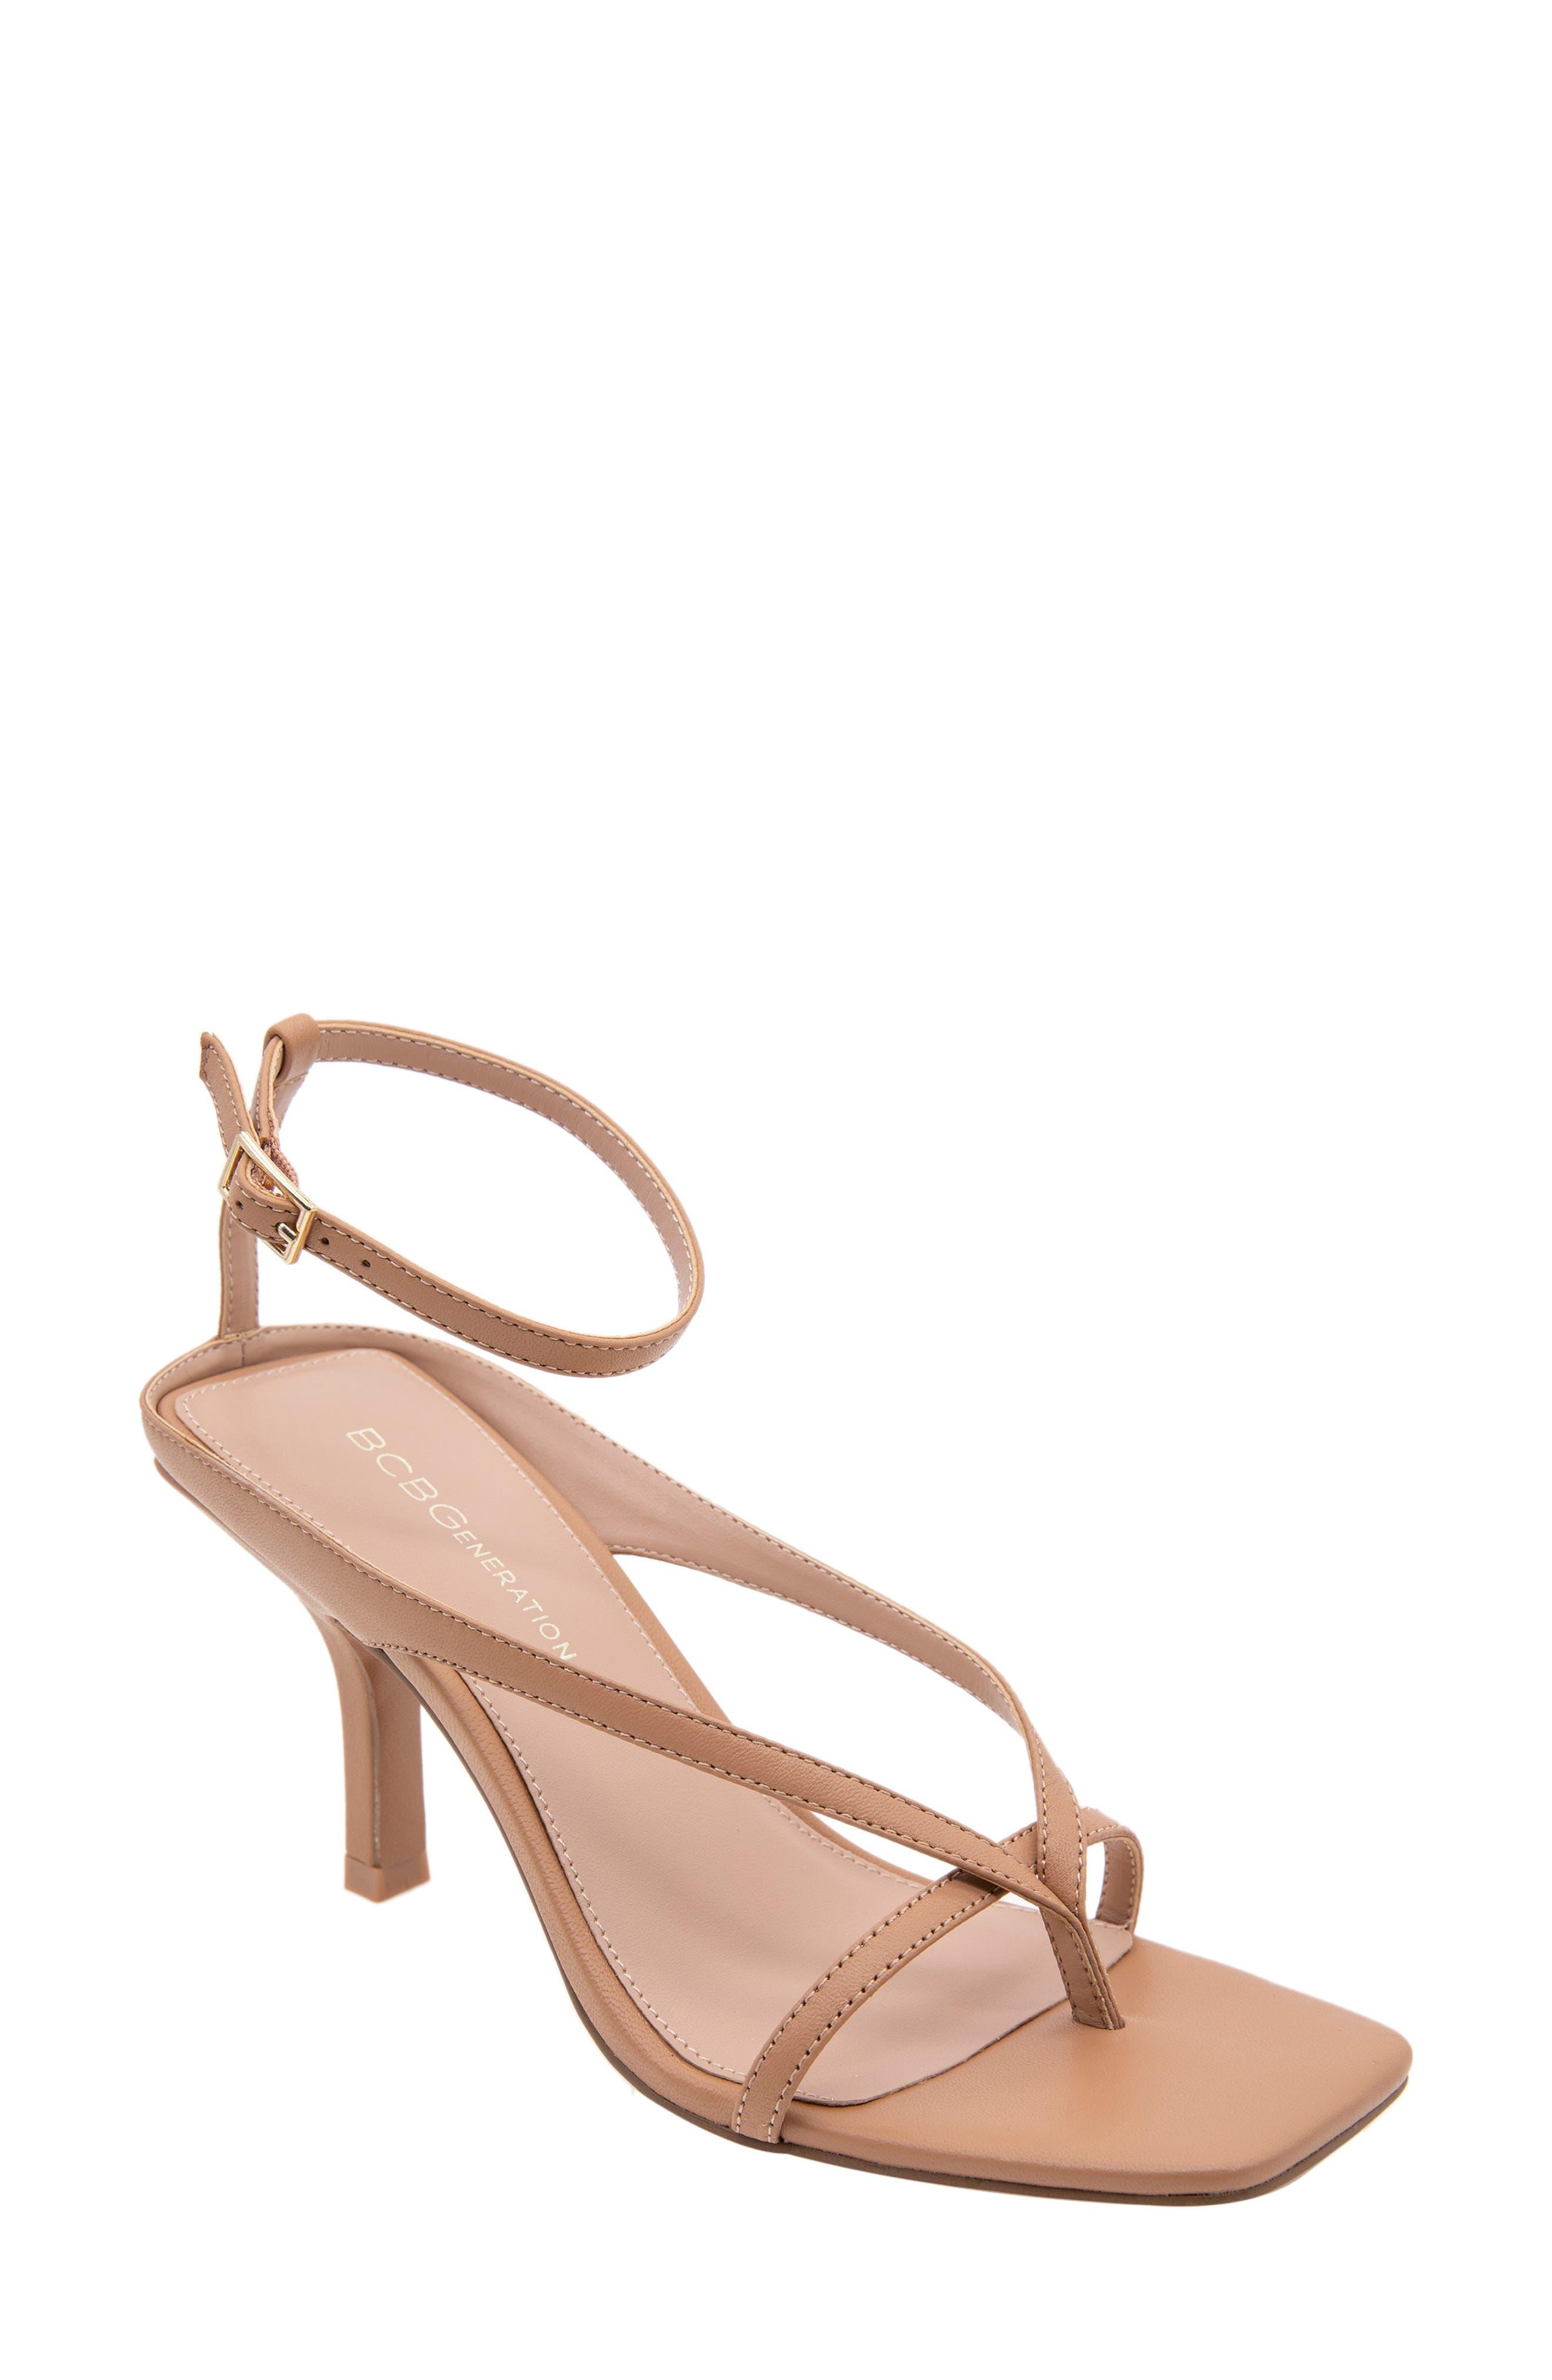 Midony Ankle Strap Sandal